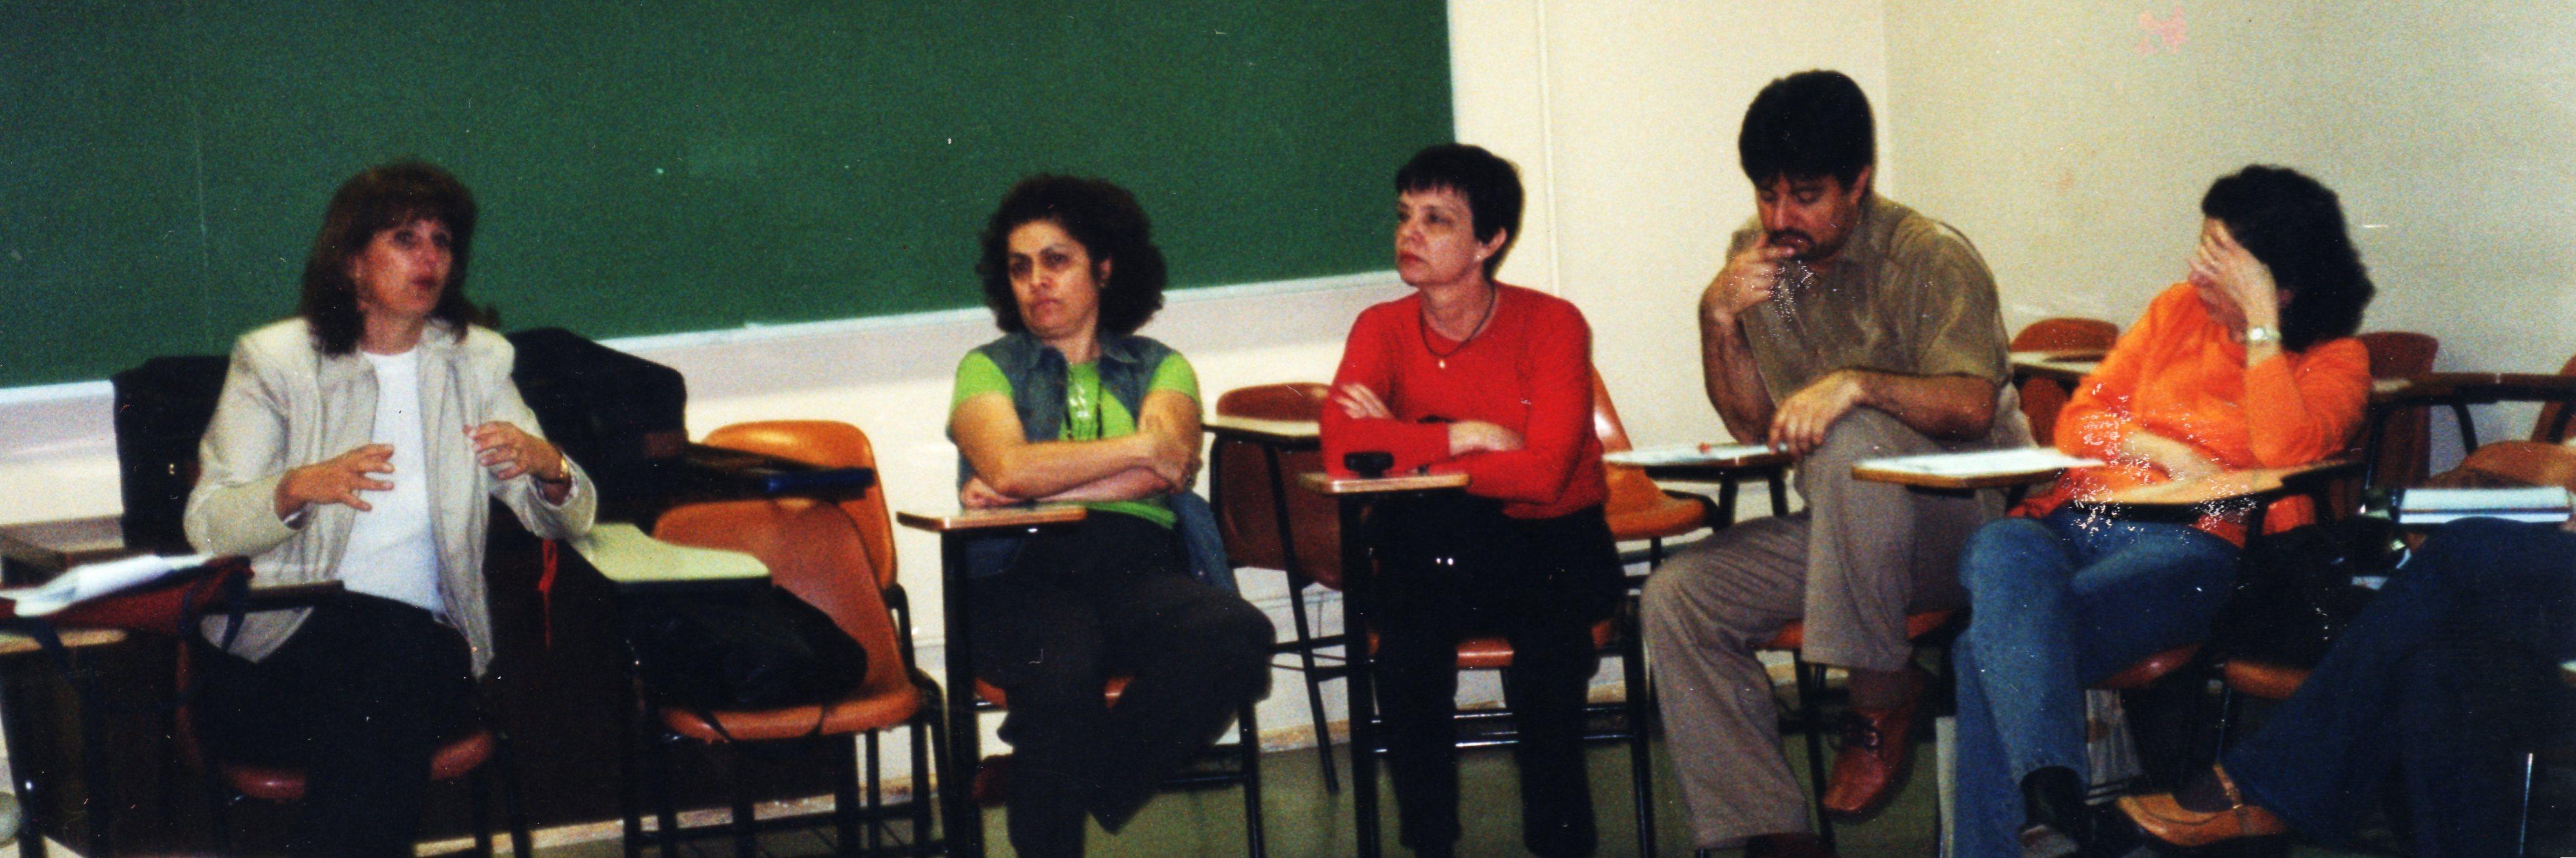 Laboratório Saúde Mental e Psicologia Clínica Social 20 anos 030